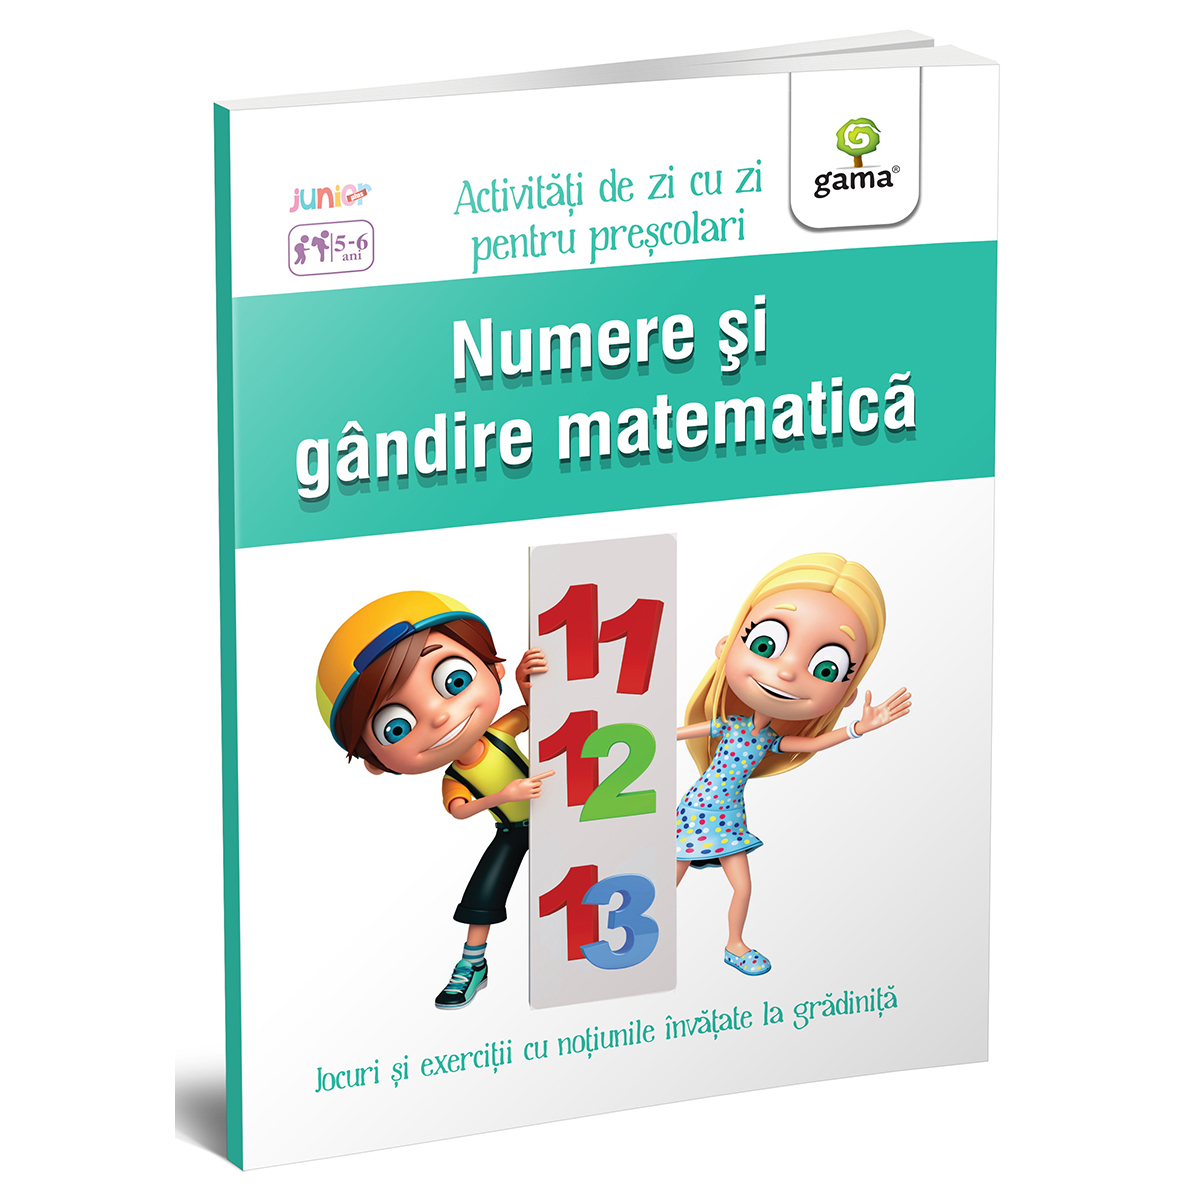 Carte Editura Gama, Numere si gandire matematica 5-6 ani, Activitati de zi cu zi